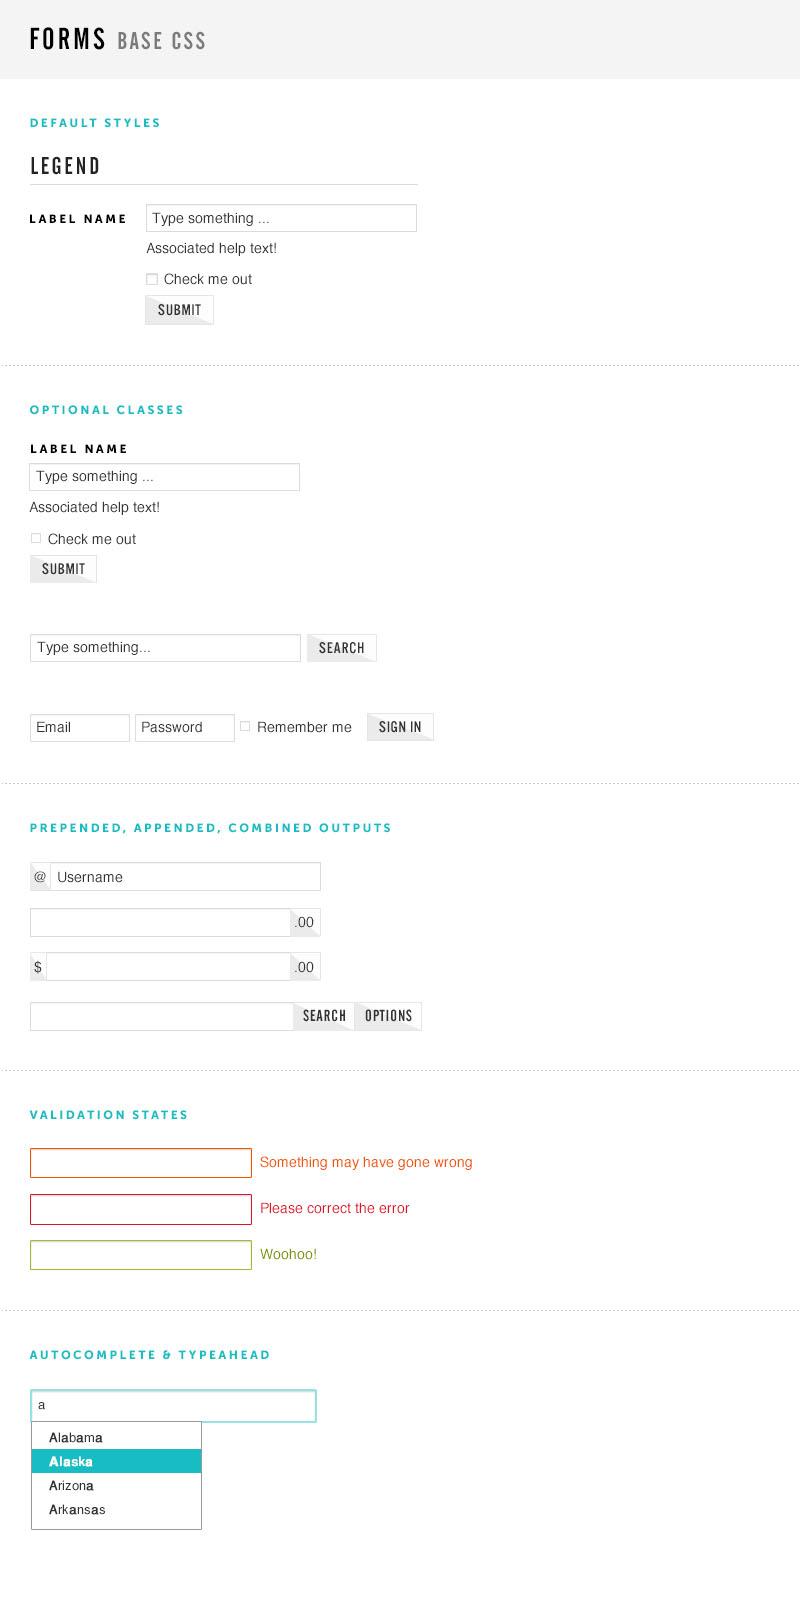 baseCSS_forms.jpg